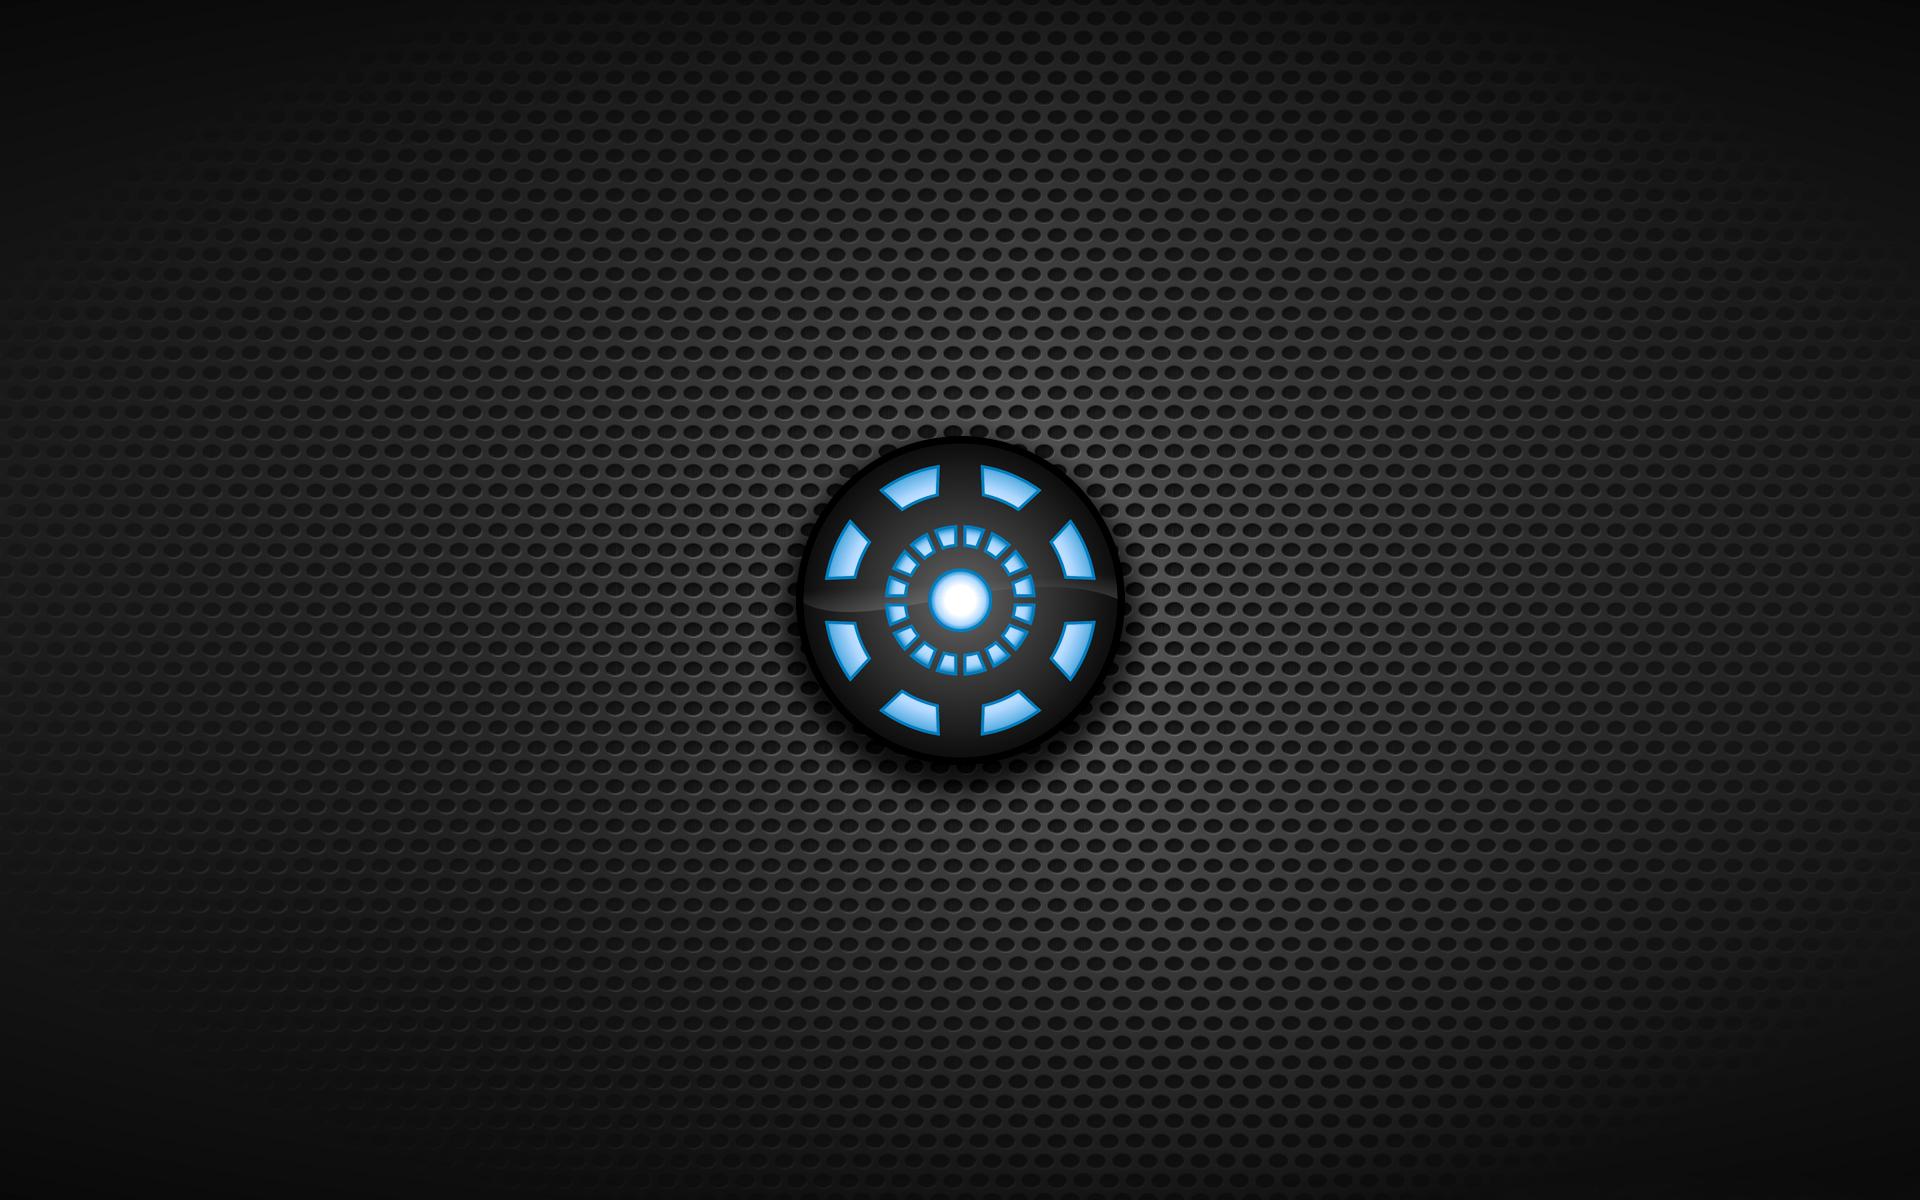 Télécharger photo logo iron man hd png